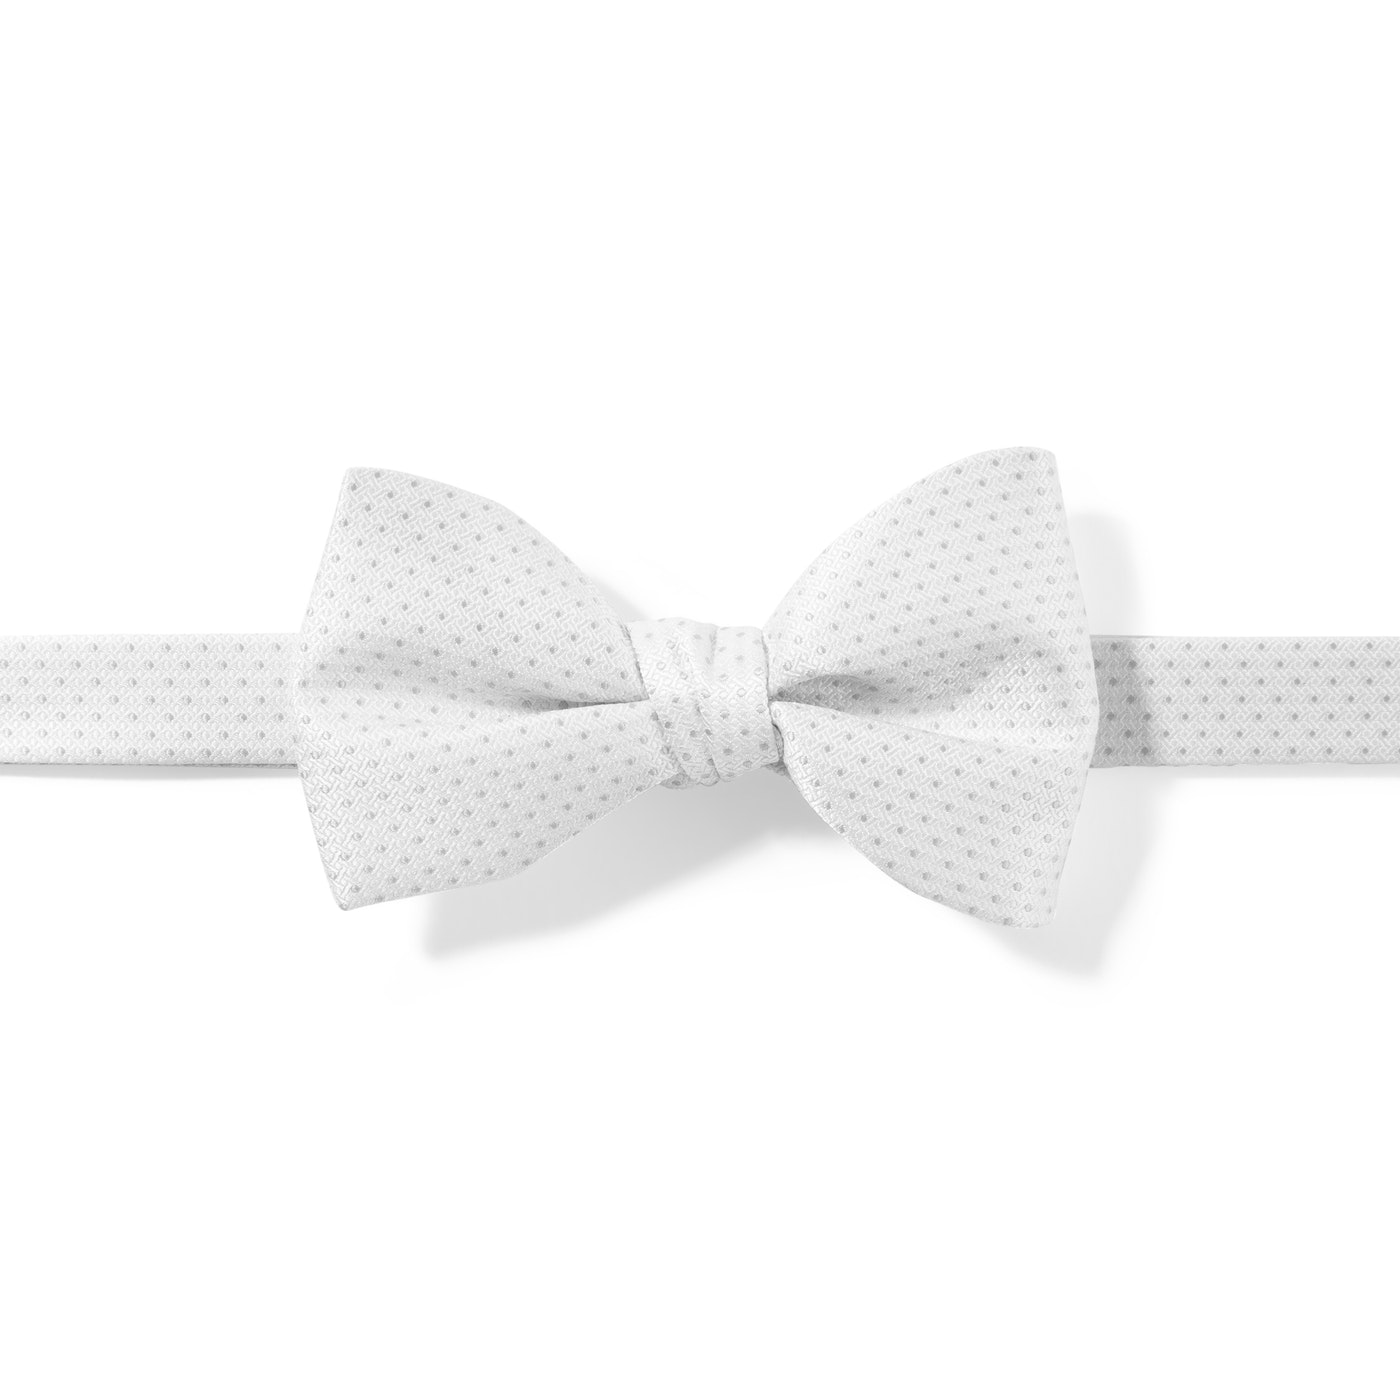 White and White Pin Dot Pre-Tied Bow Tie